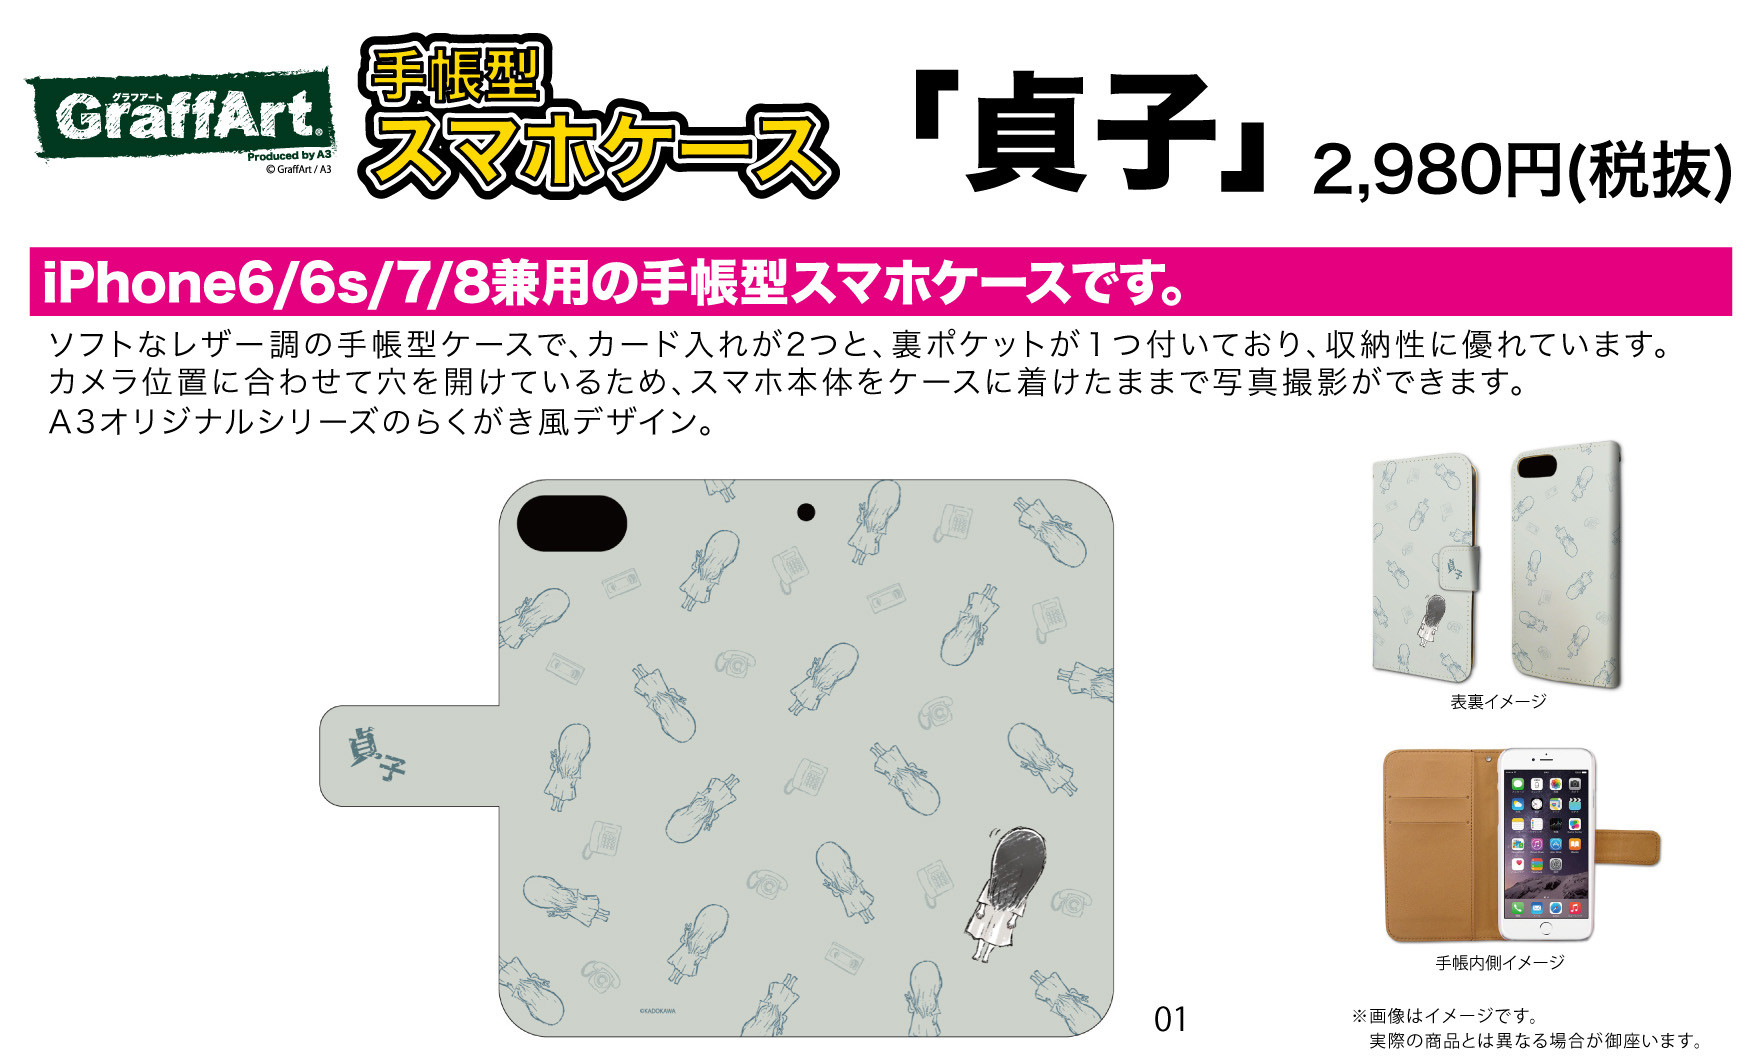 Book Type Smartphone Case for iPhone6/6S/7/8 Sadako 01 Sadako Pattern (Graff Art Design)